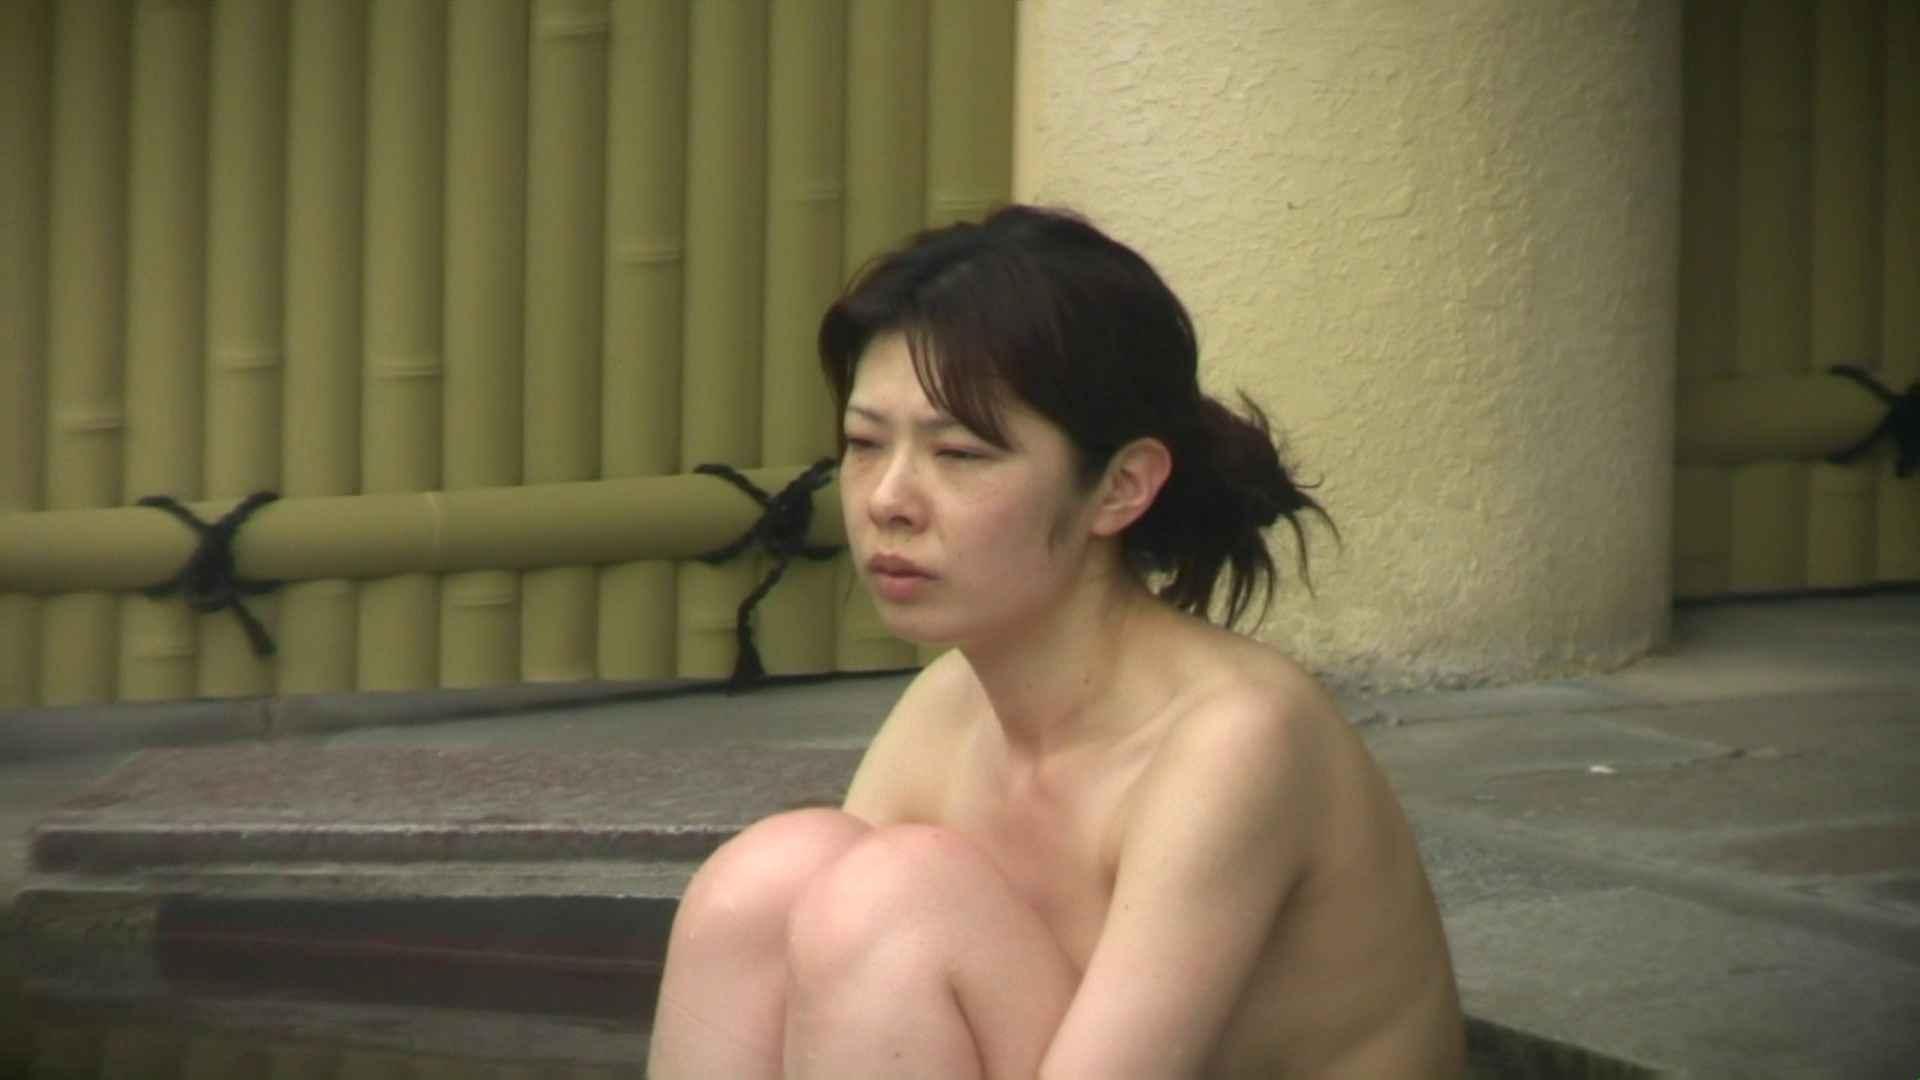 Aquaな露天風呂Vol.676 盗撮シリーズ | 露天風呂編  83PIX 1